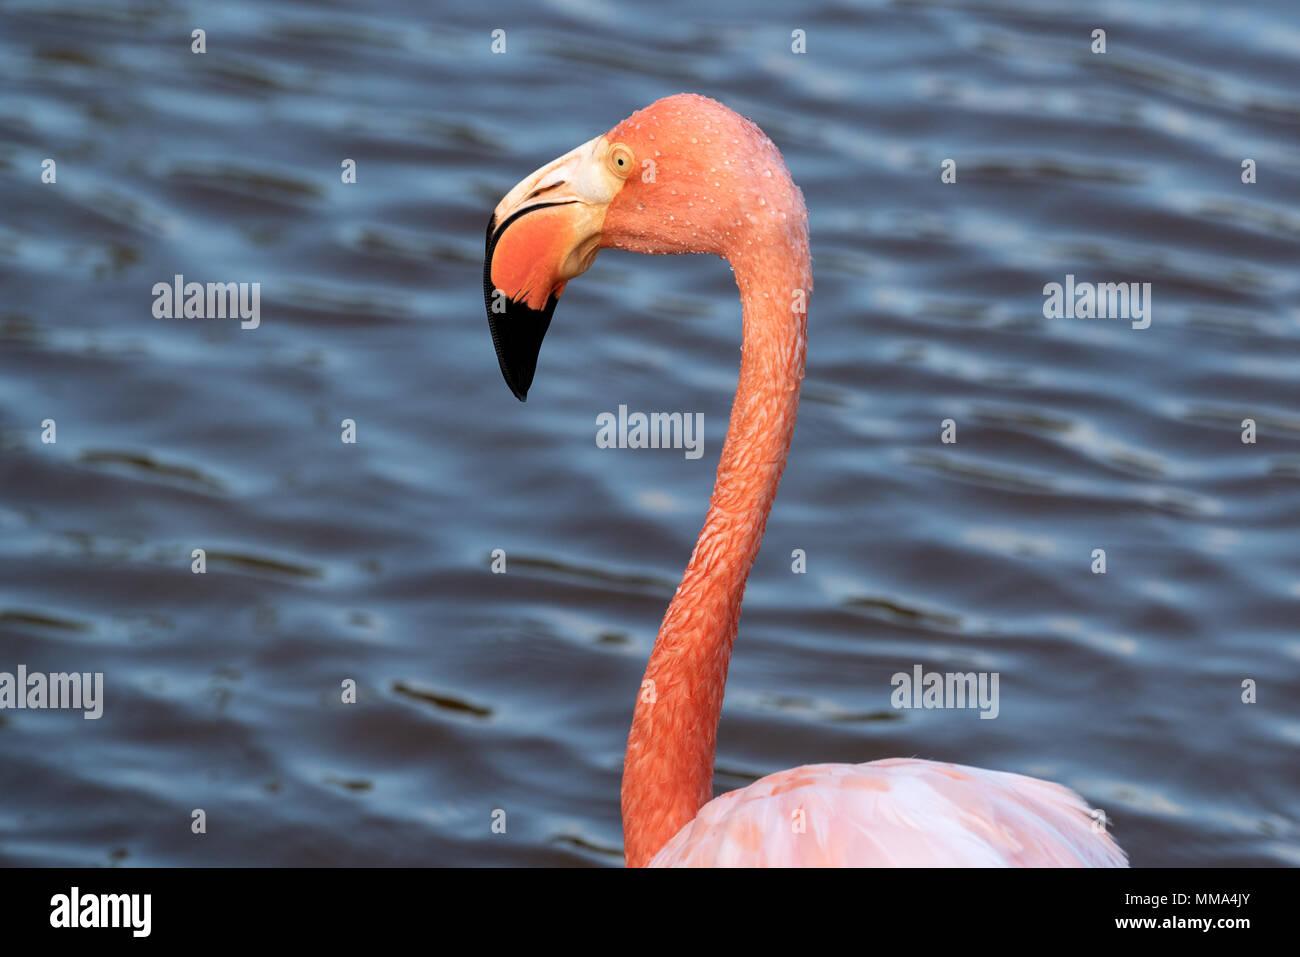 Flamingo (Phoenicopterus ruber) in a lagoon on Isabela Island, Galapagos Islands, Ecuador. Stock Photo